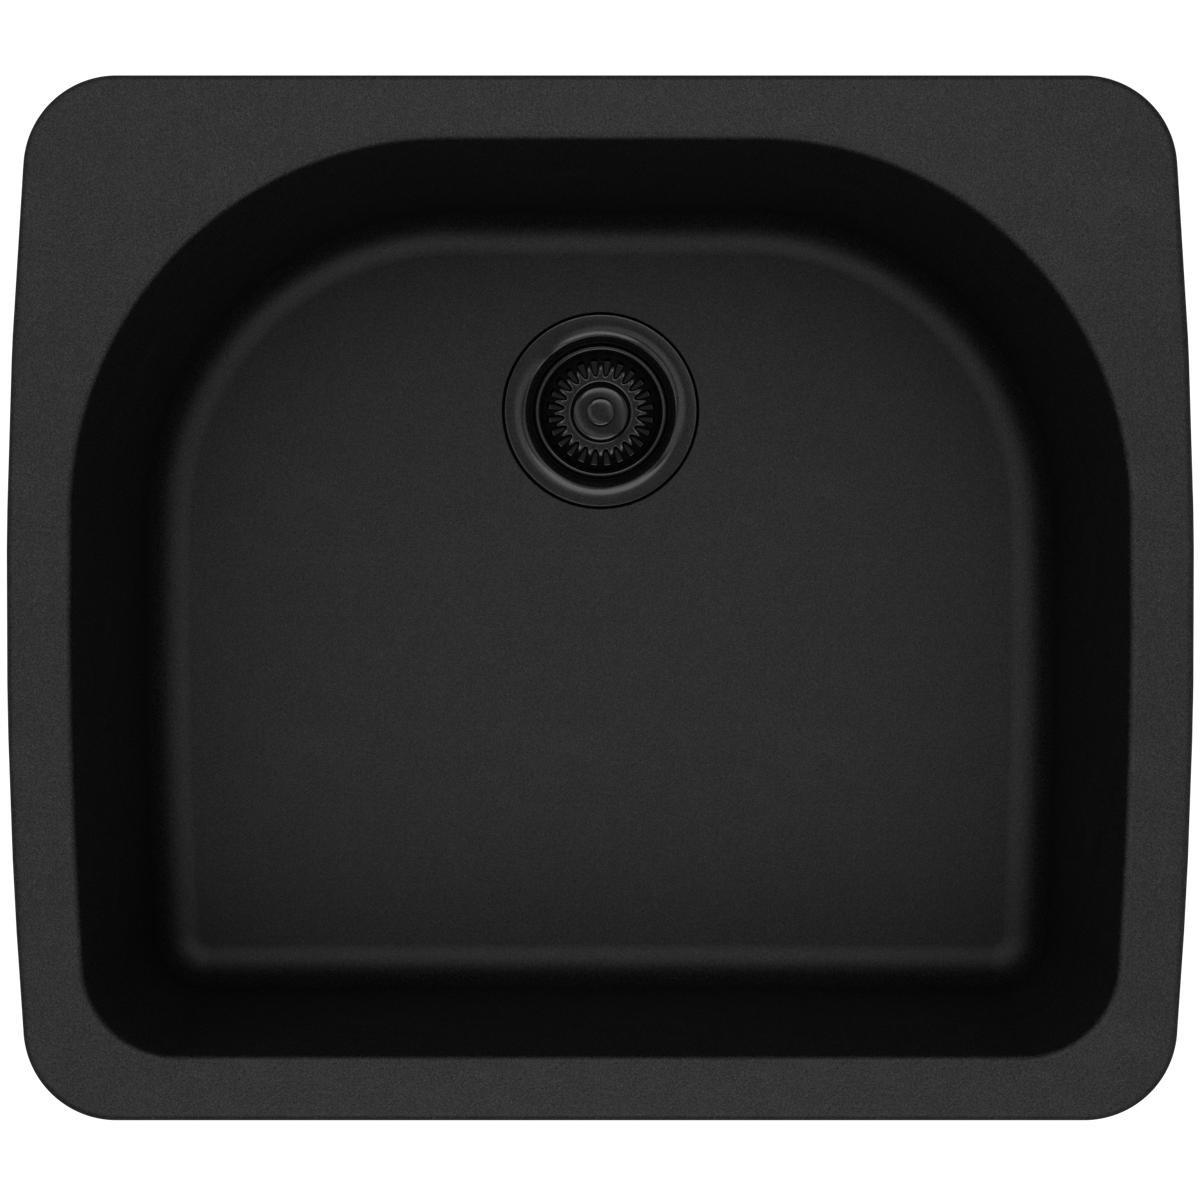 Elkay Quartz Classic ELGS2522BK0 Black Single Bowl Top Mount Sink